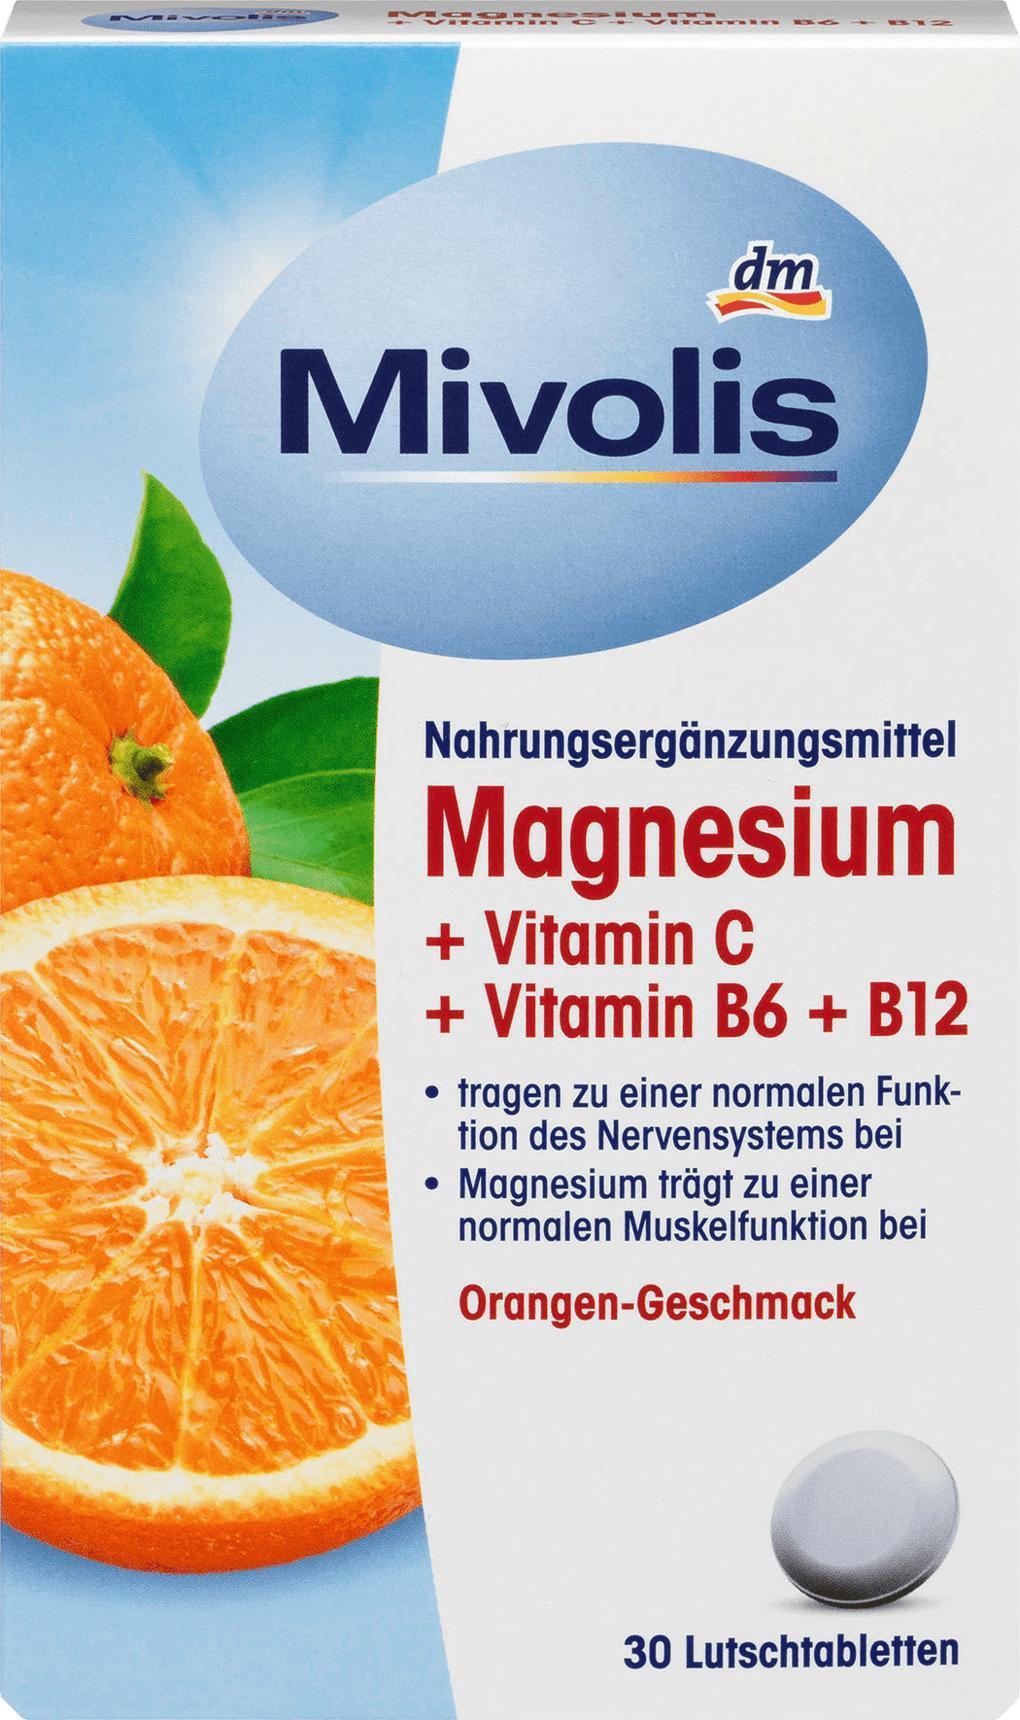 Отзыв на Magnesium + Vitamin C + Vitamin B6 + B12, Lutschtabletten, 30 St., 45 g из Интернет-Магазина DM